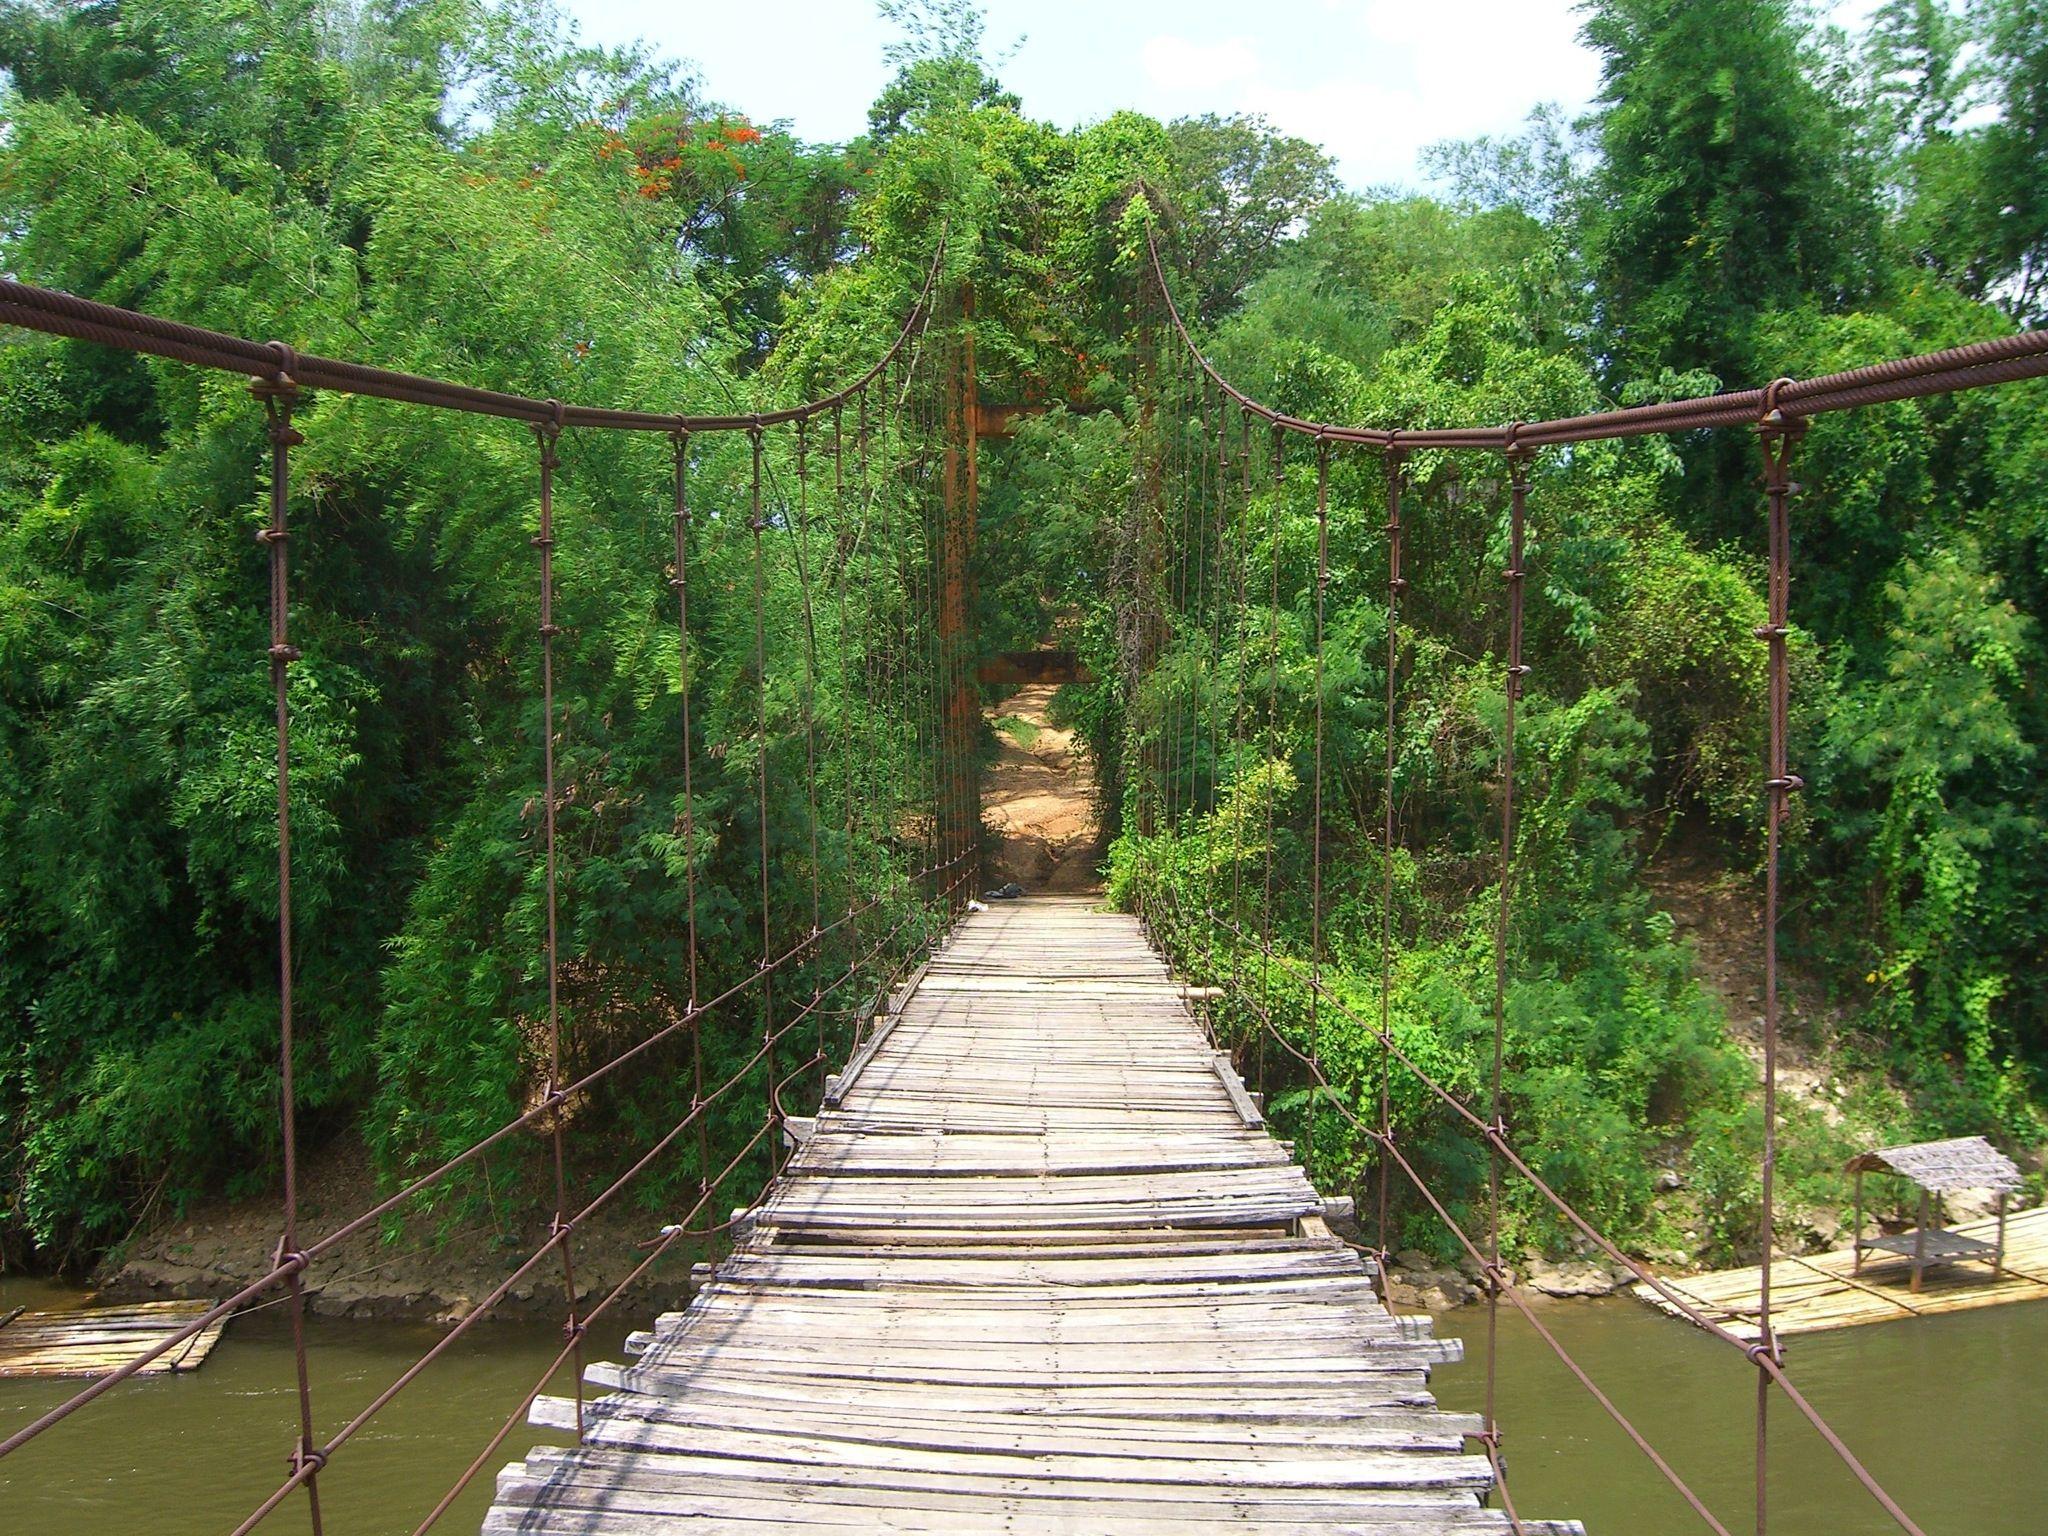 De #RiverKwai in #Kanchanaburi. Een mooi stukje natuur in Centraal-Thailand! #thailand #travelsmartnl